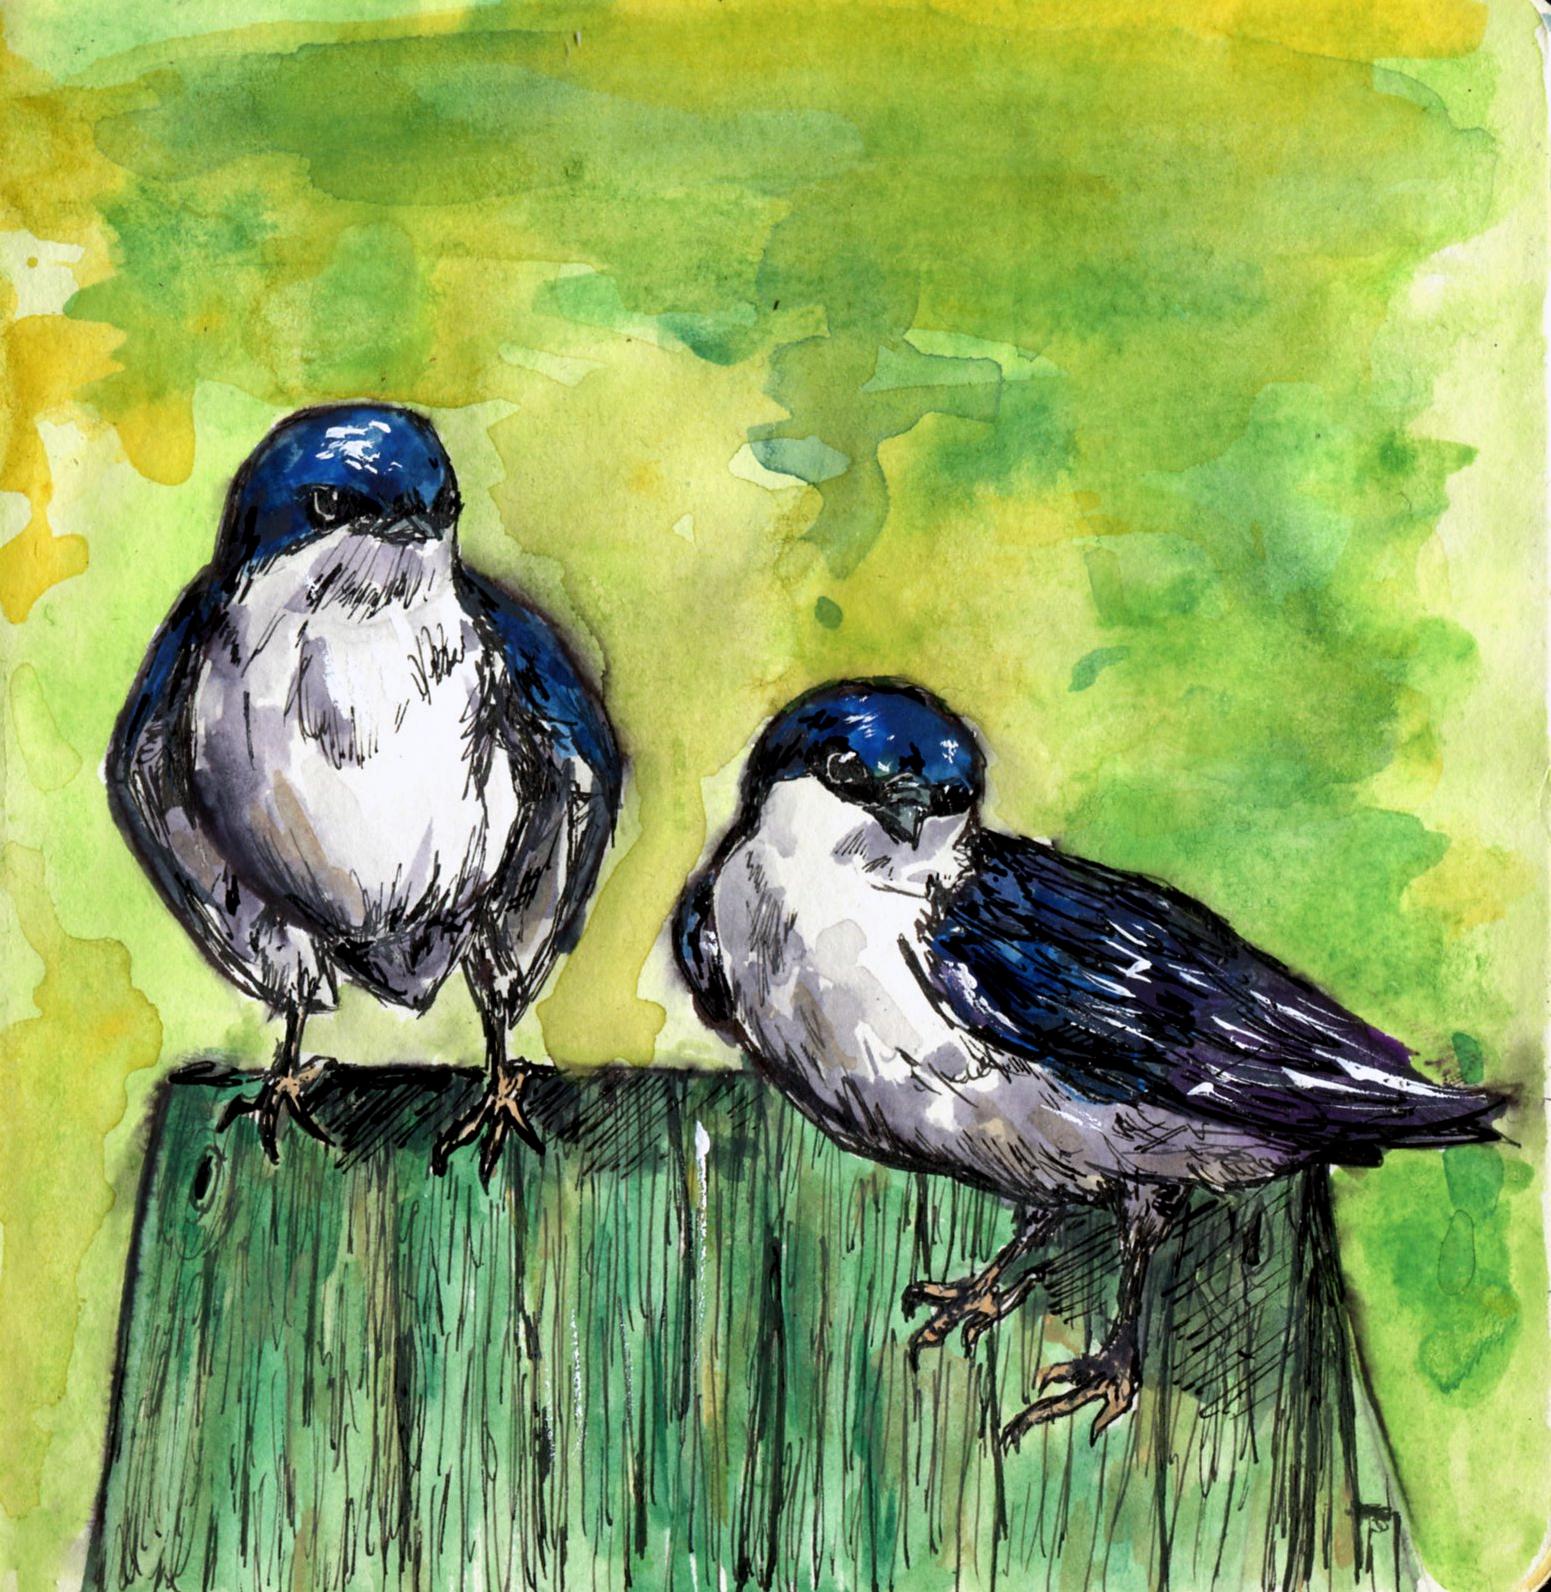 67. Tree Swallow